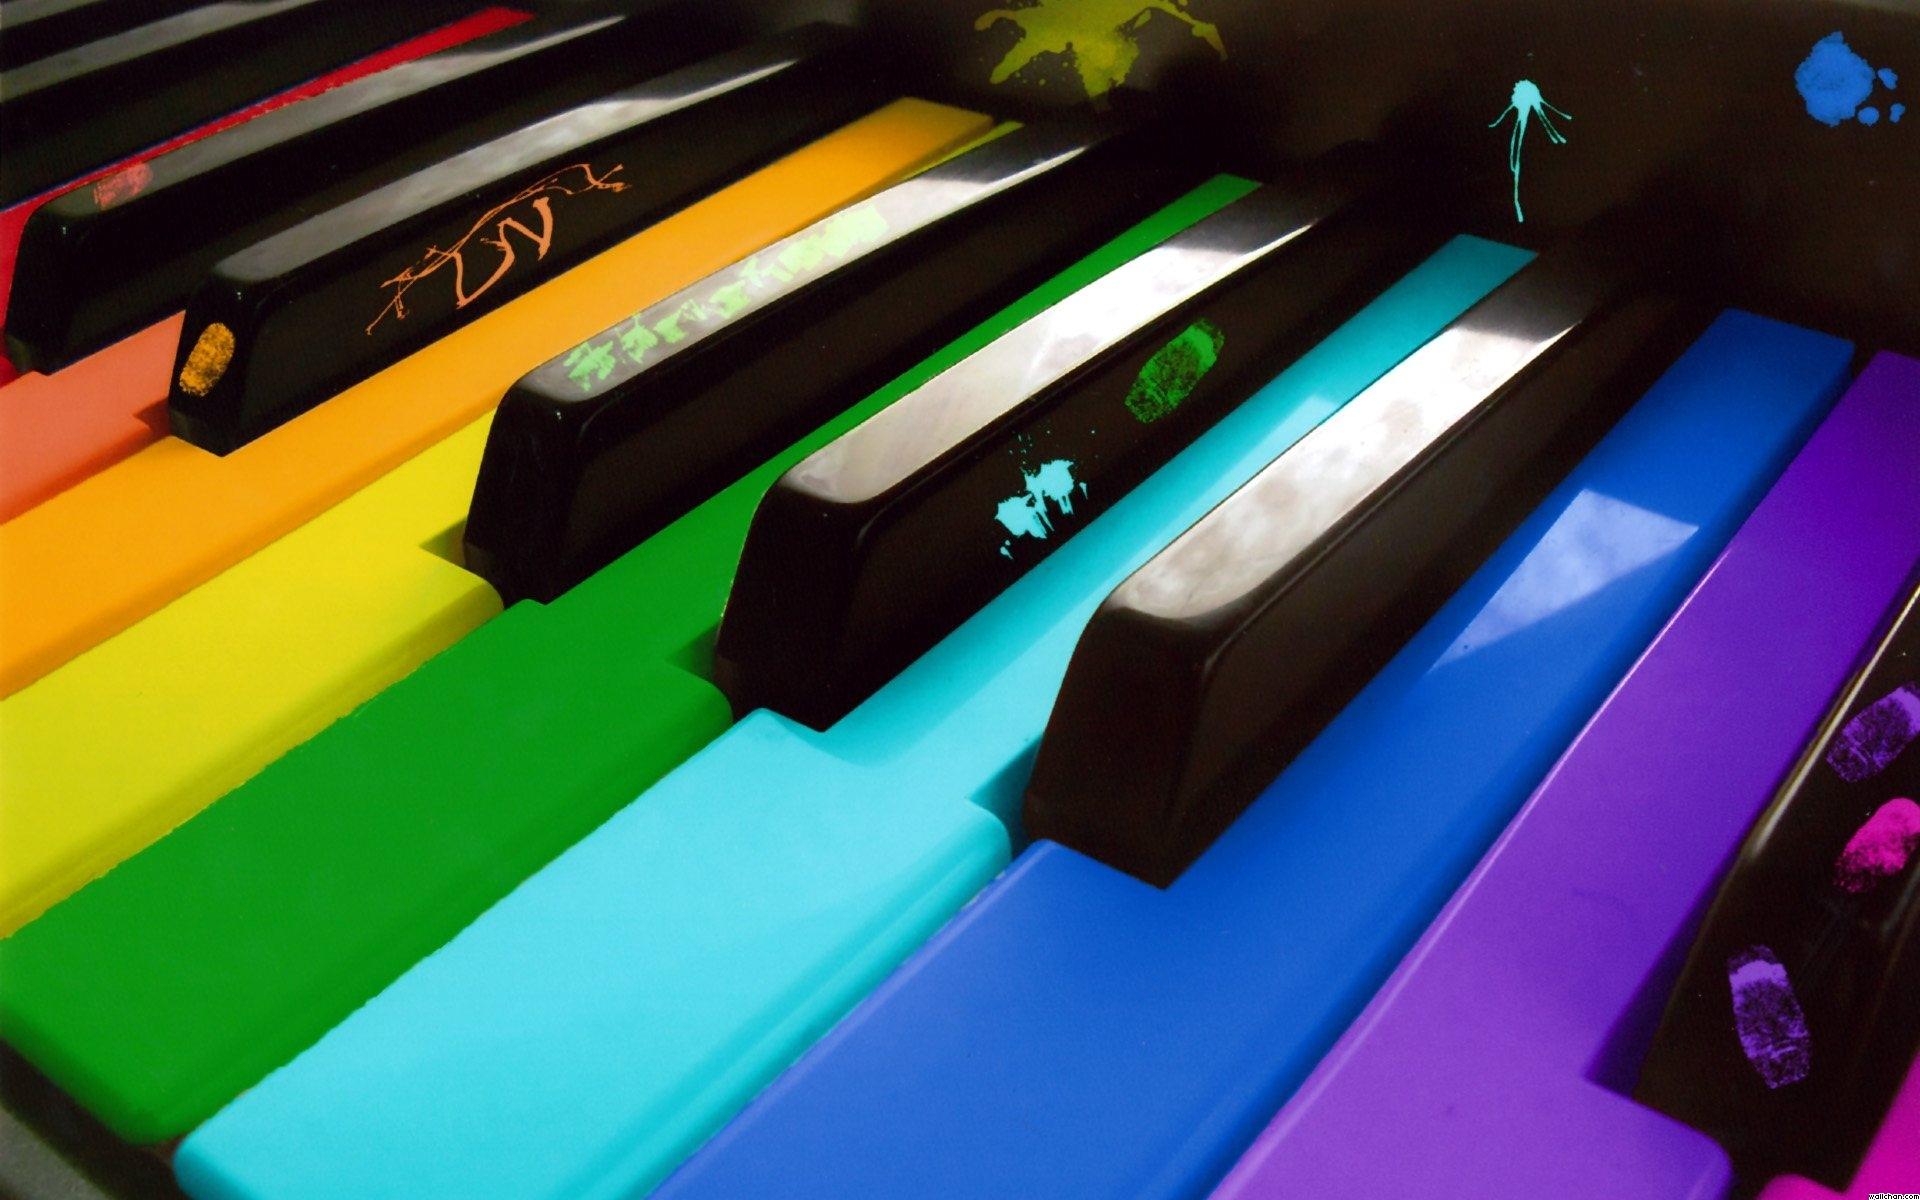 Piano-Wallpaper-music-24173627-1920-1200